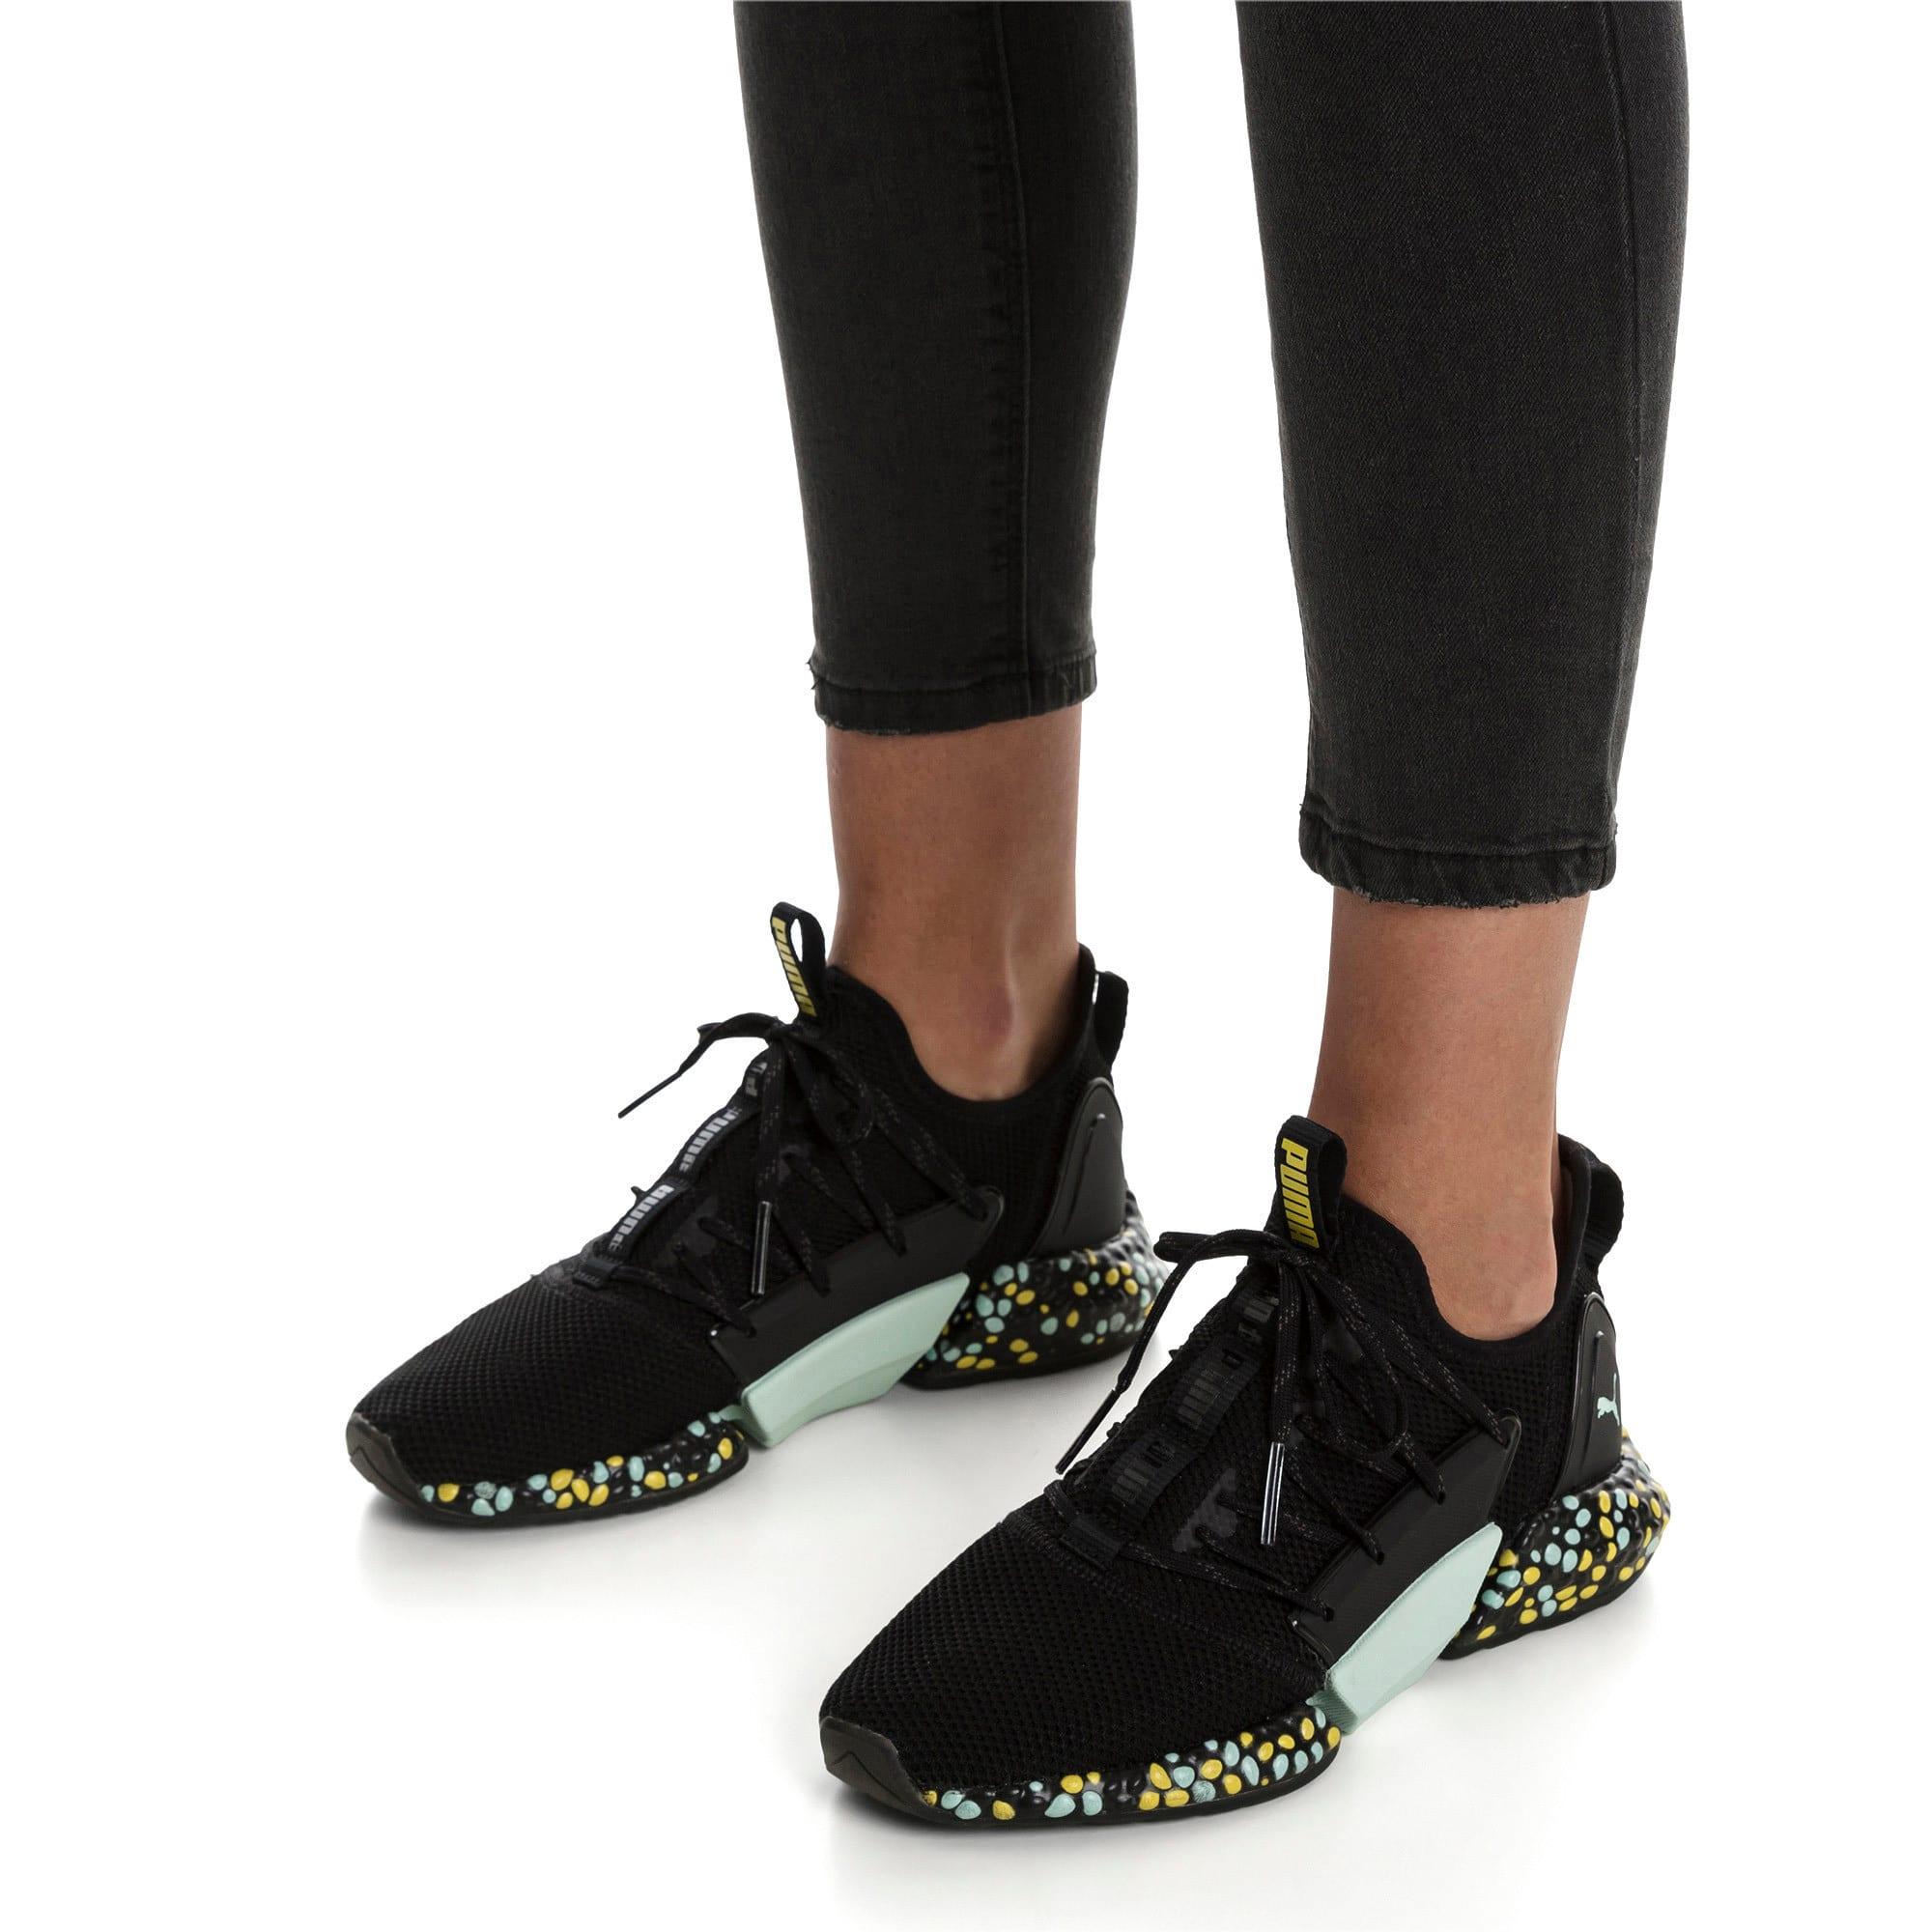 Thumbnail 2 of Hybrid Rocket Women's Running Shoes, Black-Fair Aqua-Yellow, medium